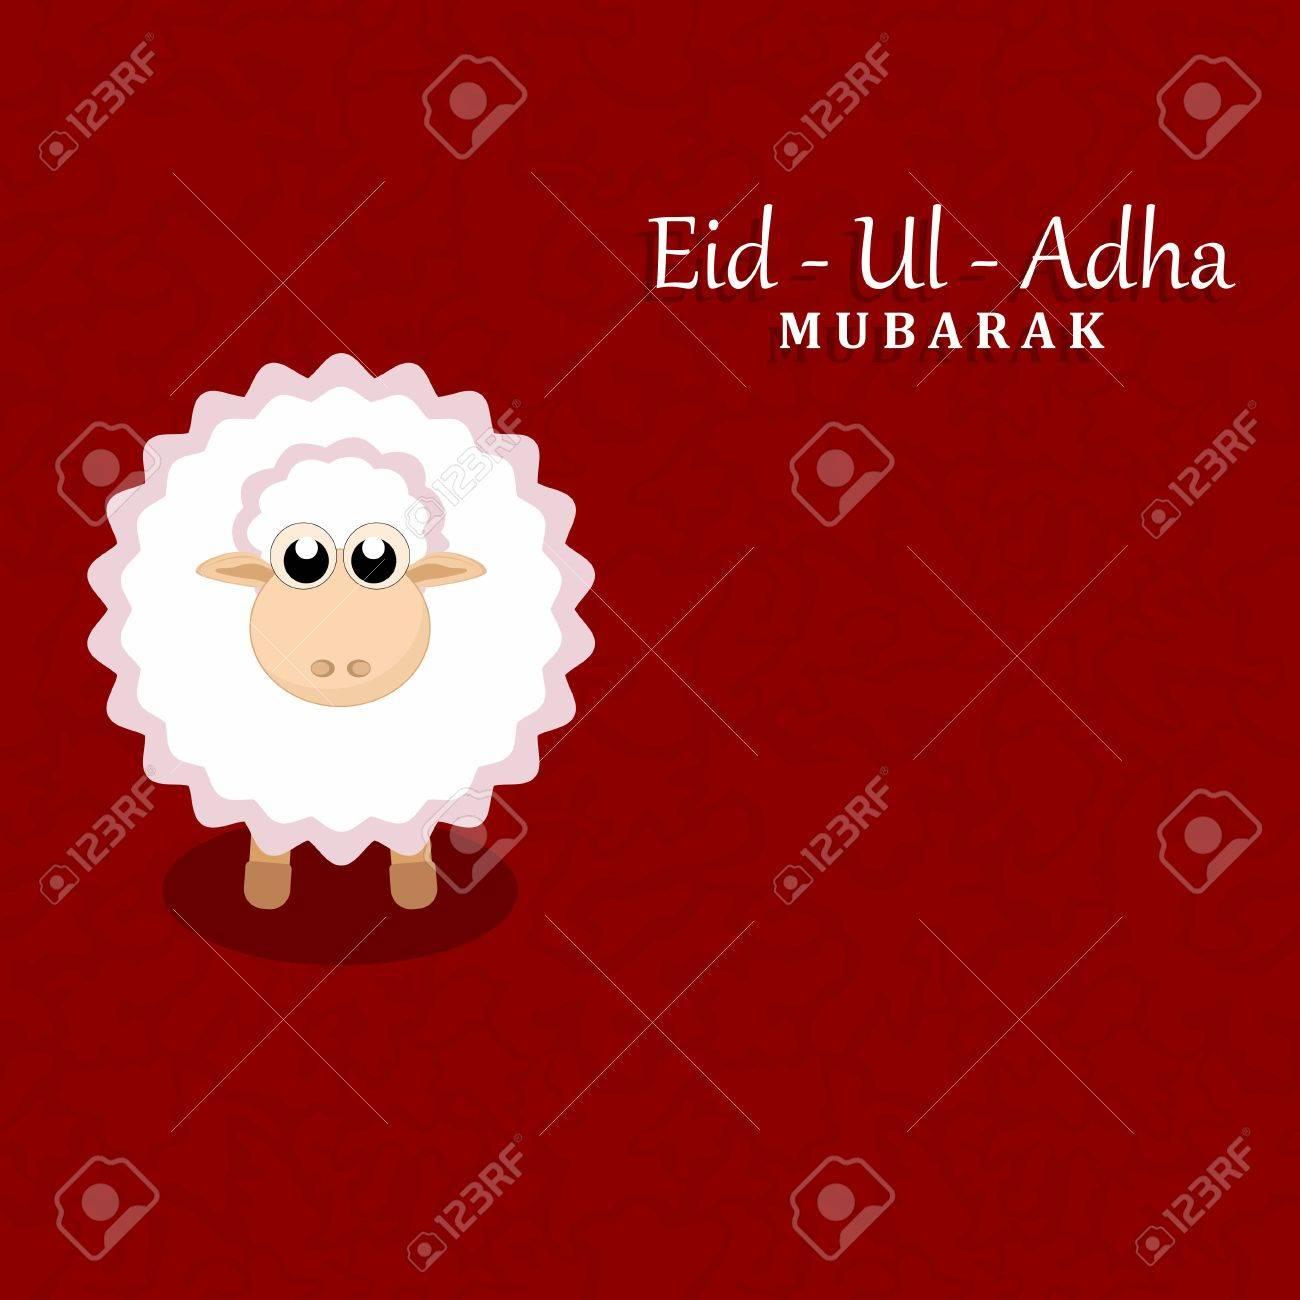 Muslim Community Festival Of Sacrifice Eid Ul Adha Mubarak Greeting